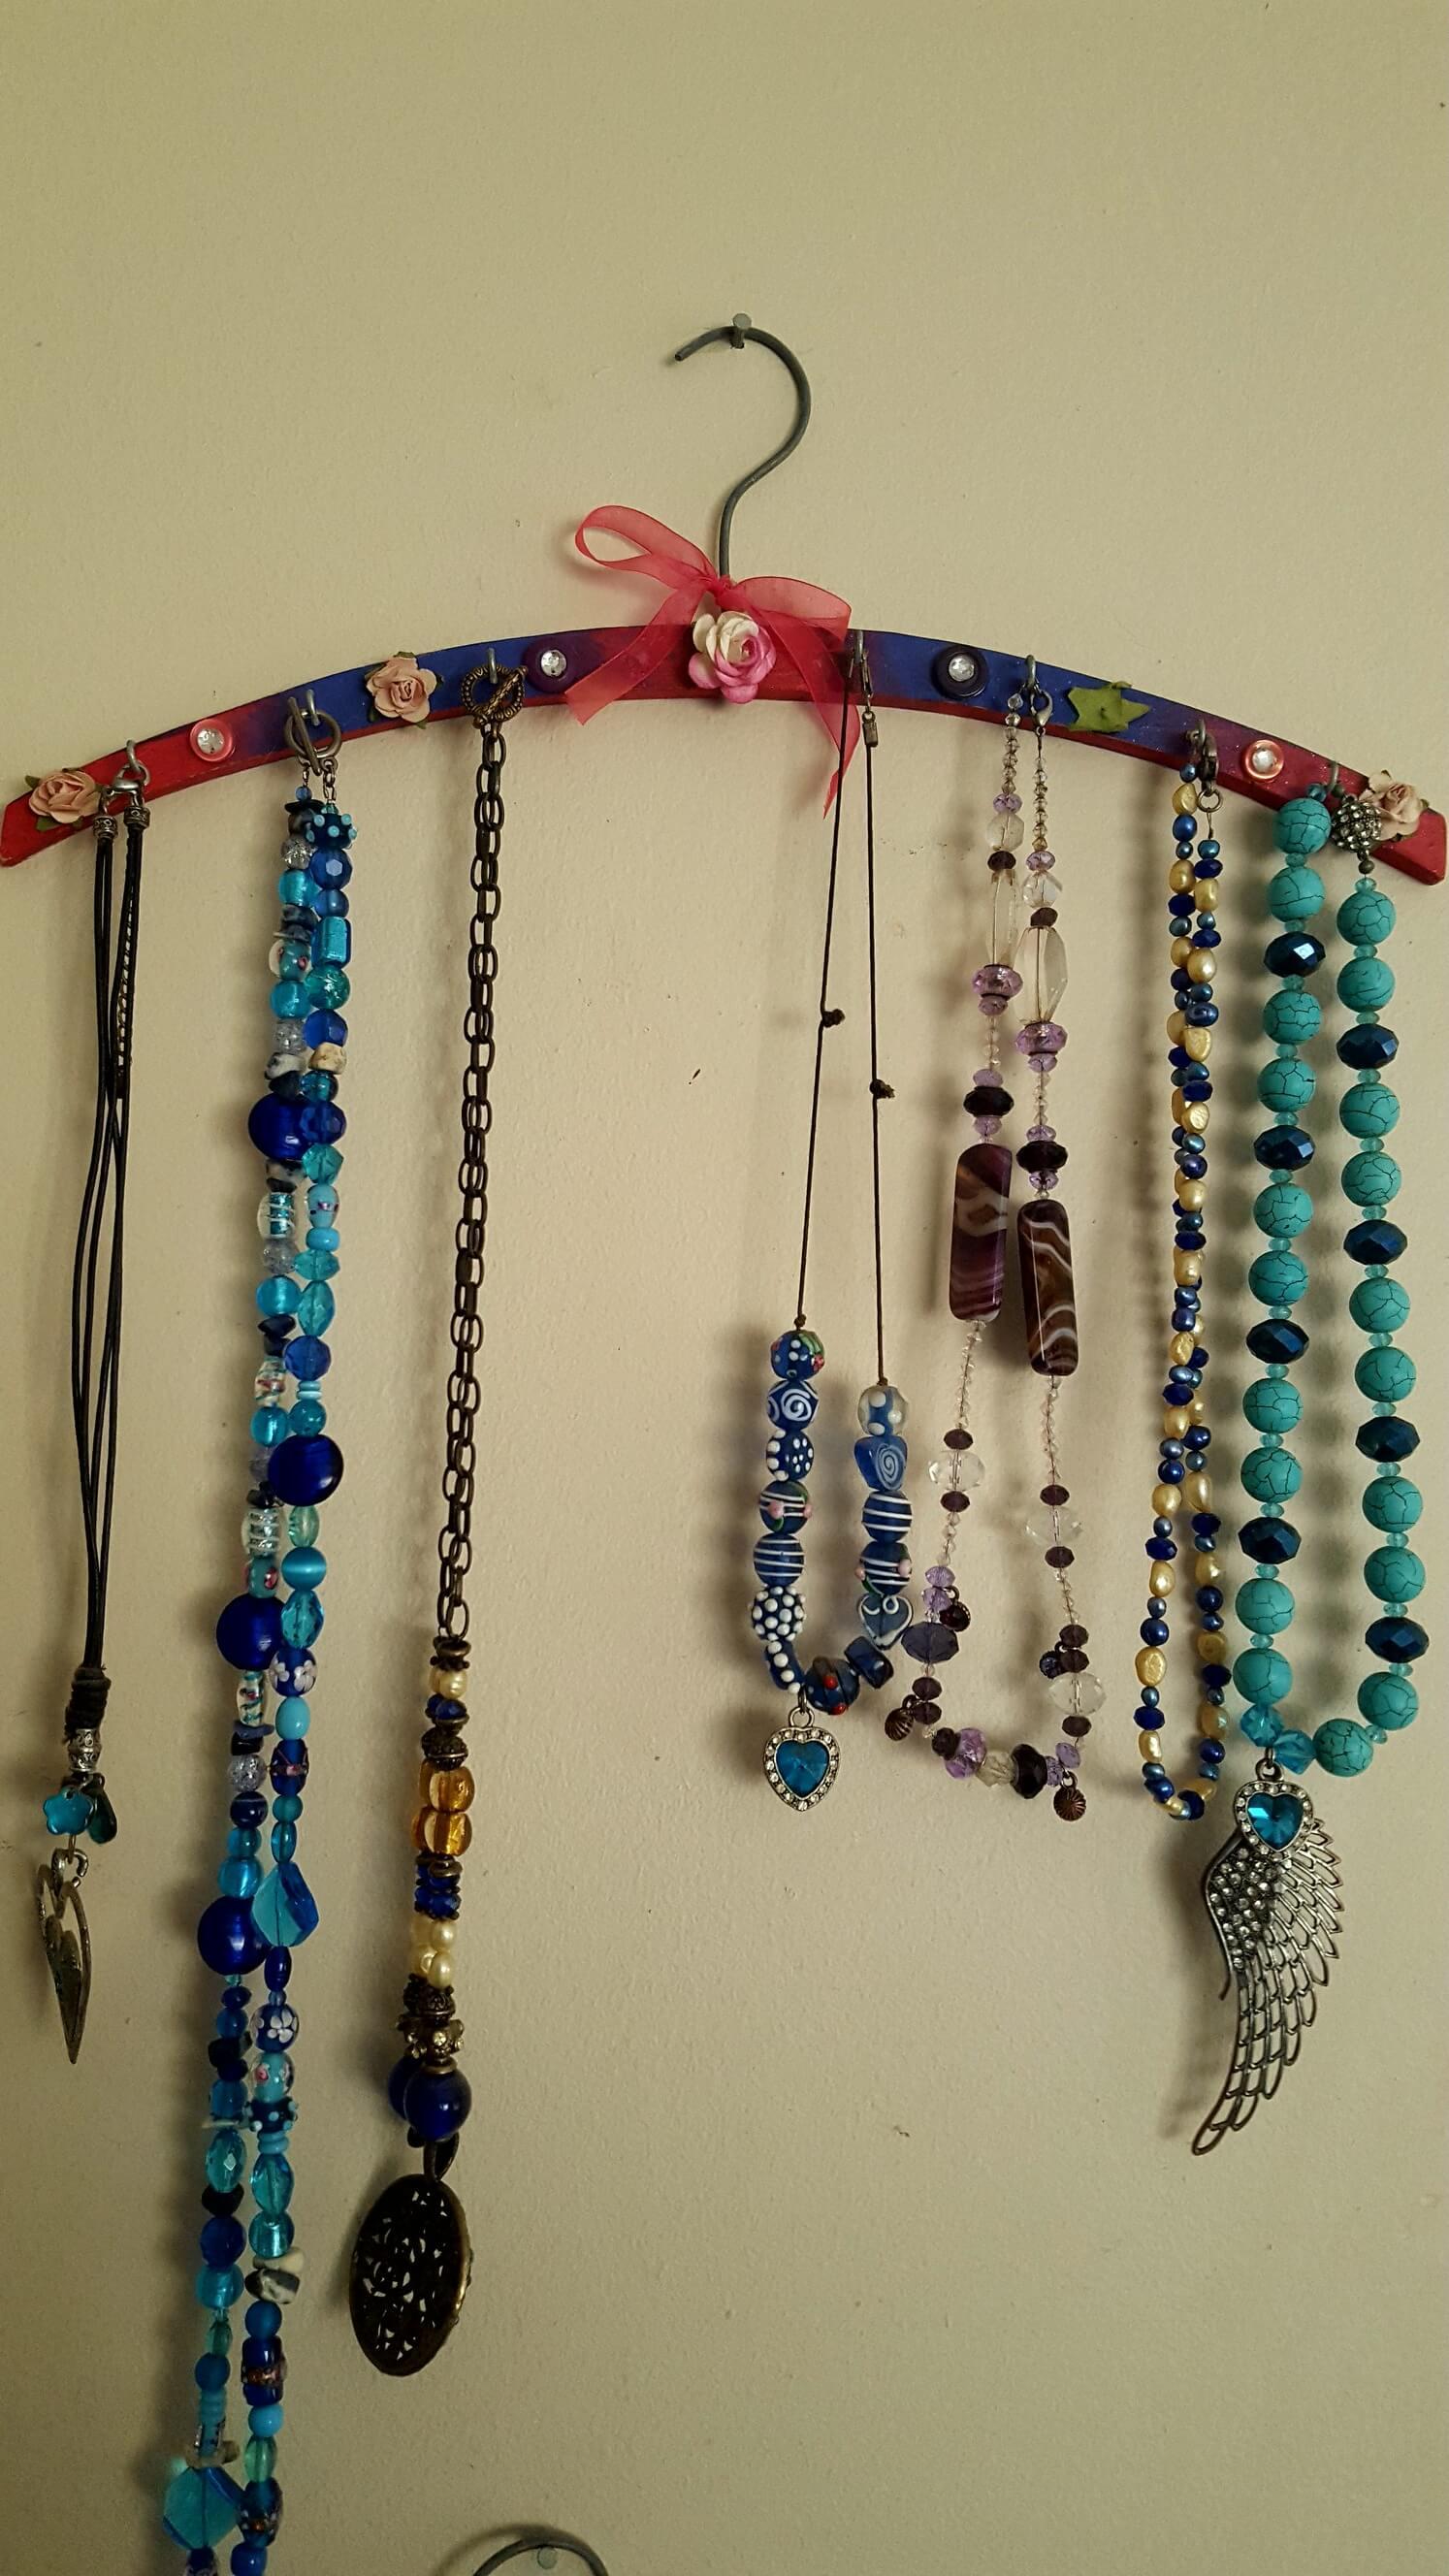 Jewellery care blog post 2 (1)